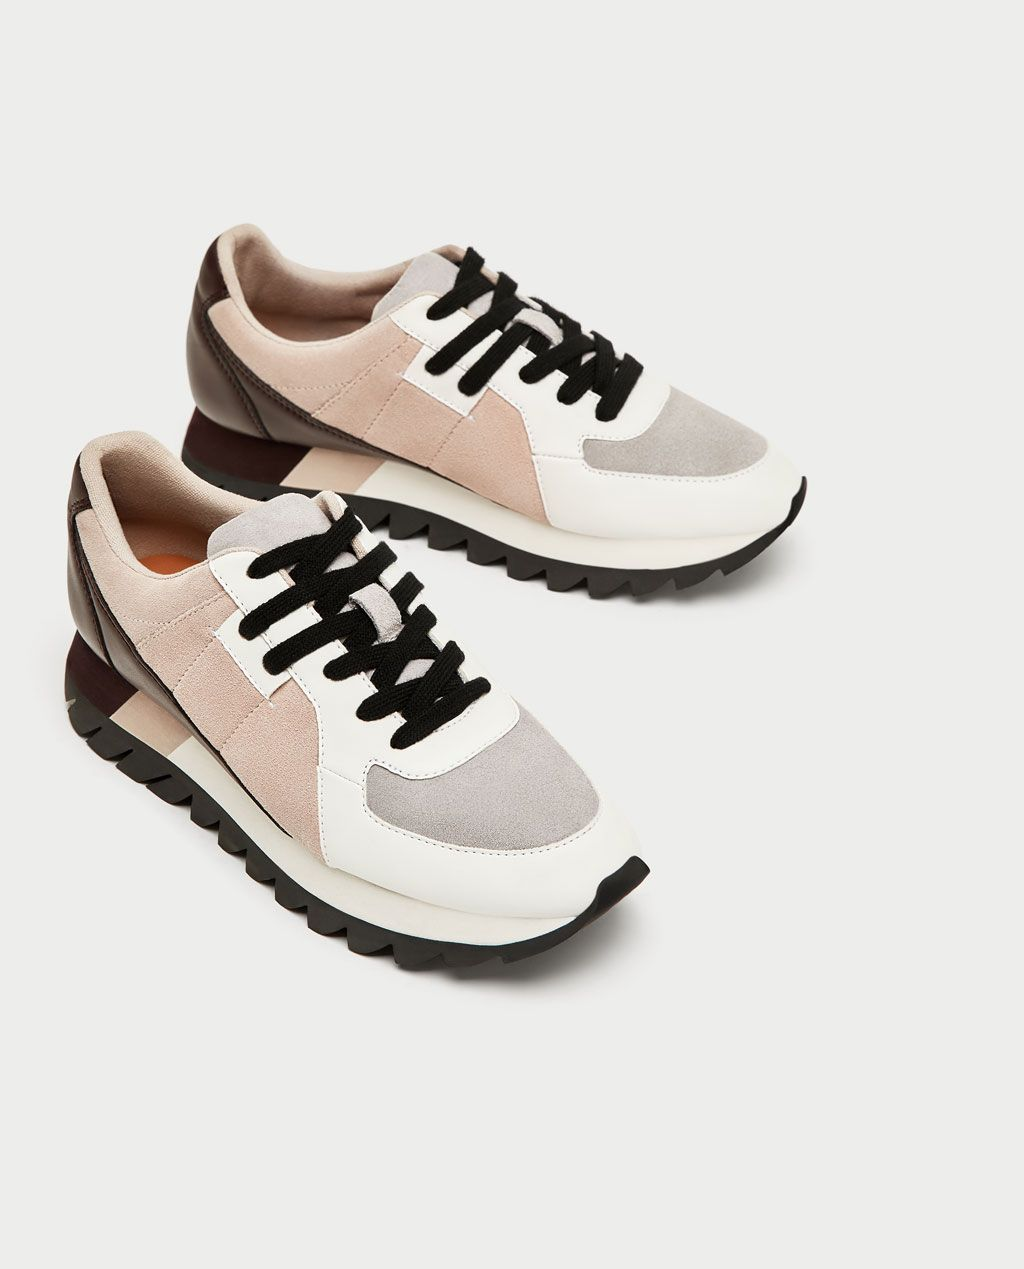 puma zapatos hombre futbol zara